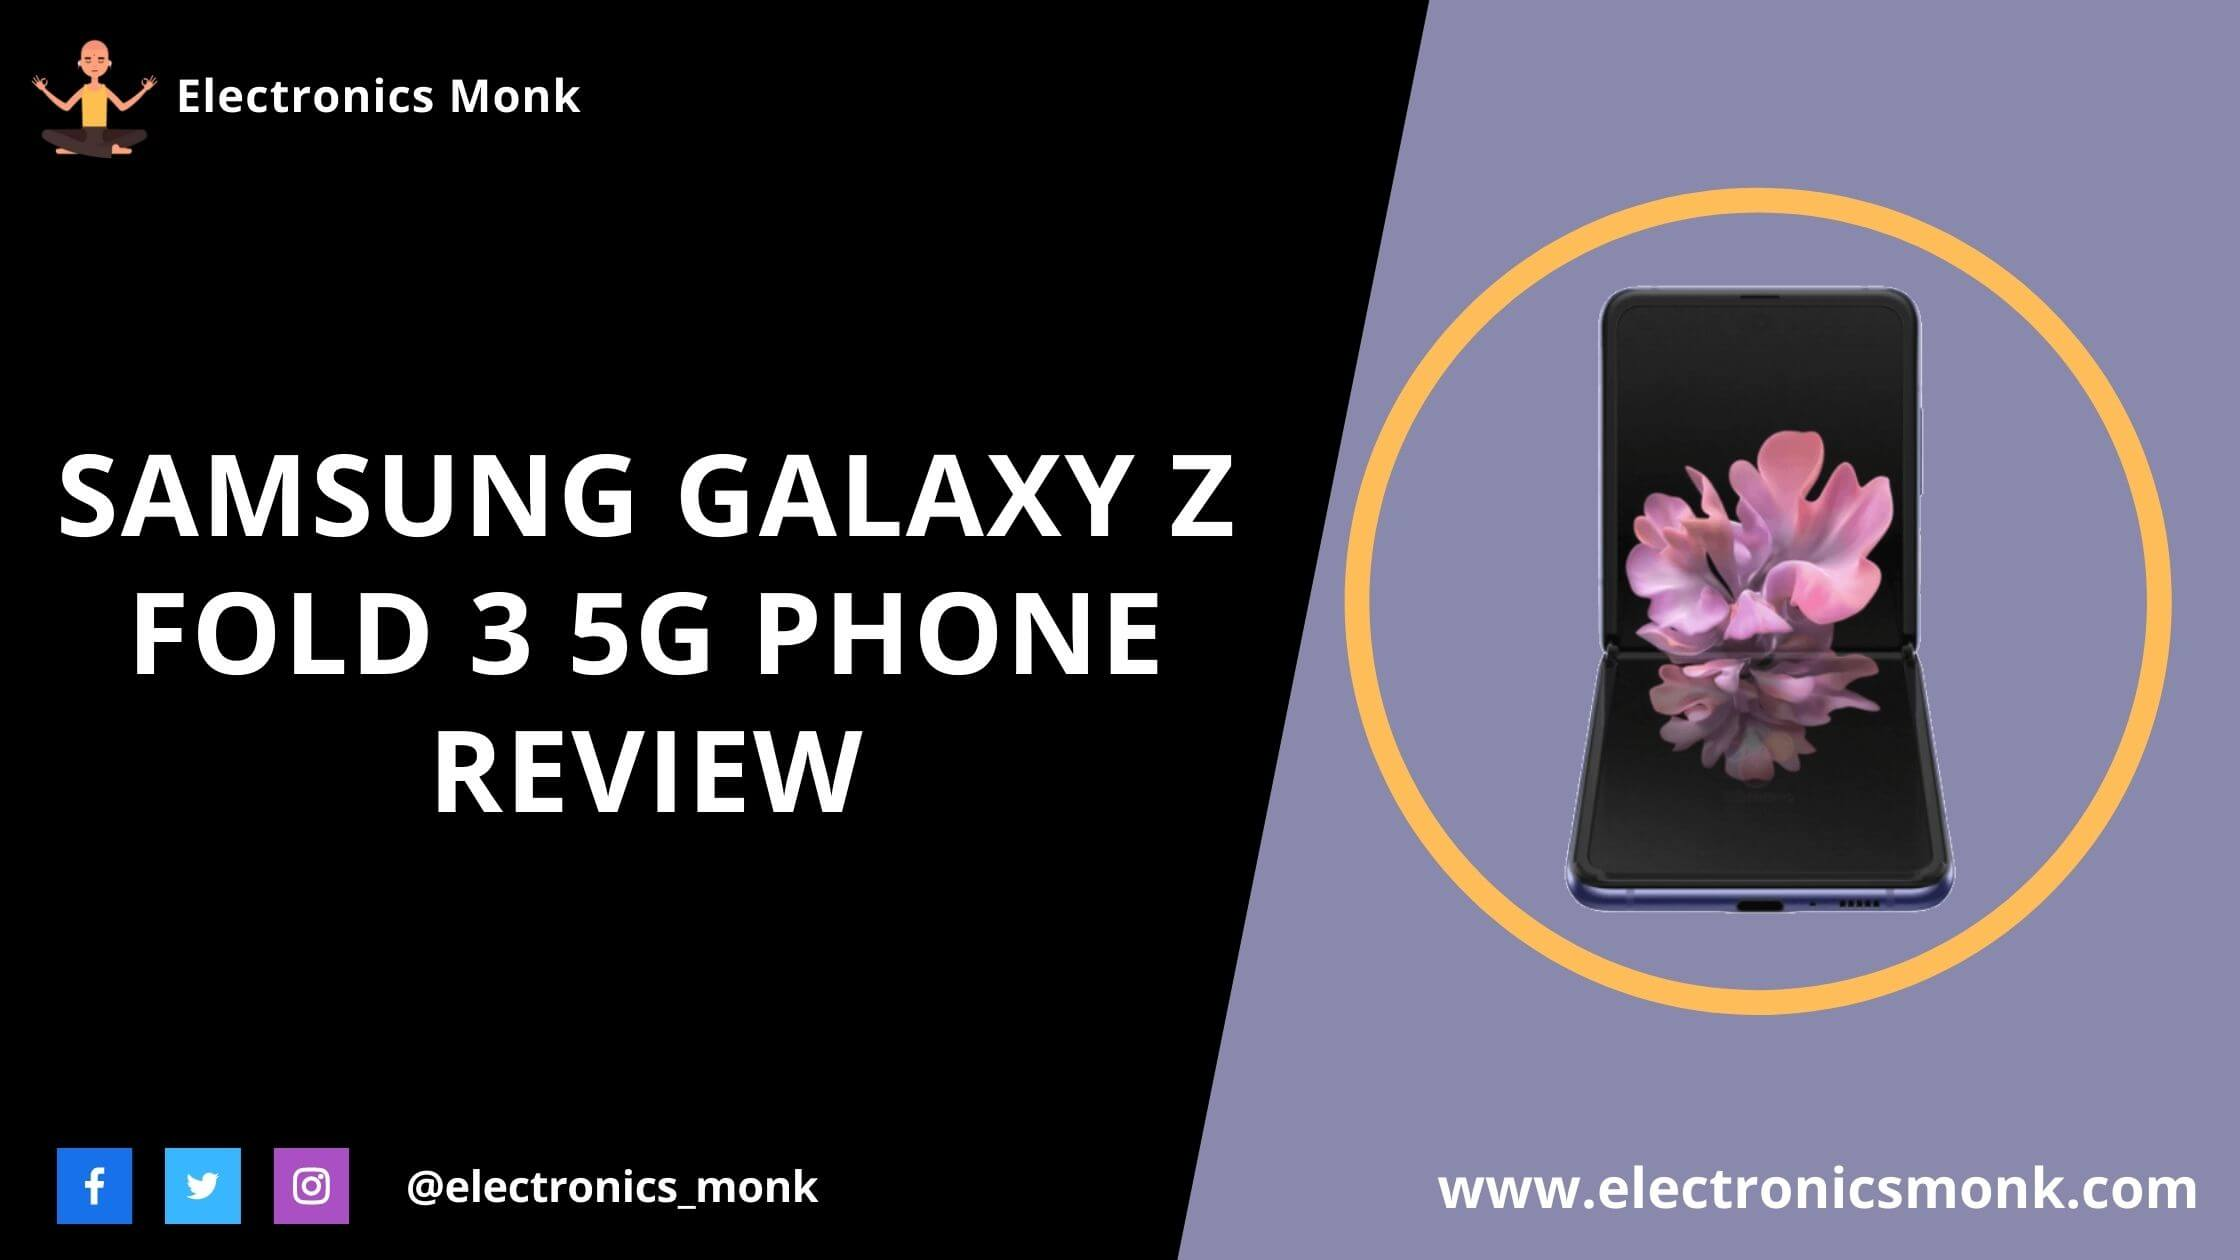 Samsung Galaxy Z Fold 3 5G Phone Review